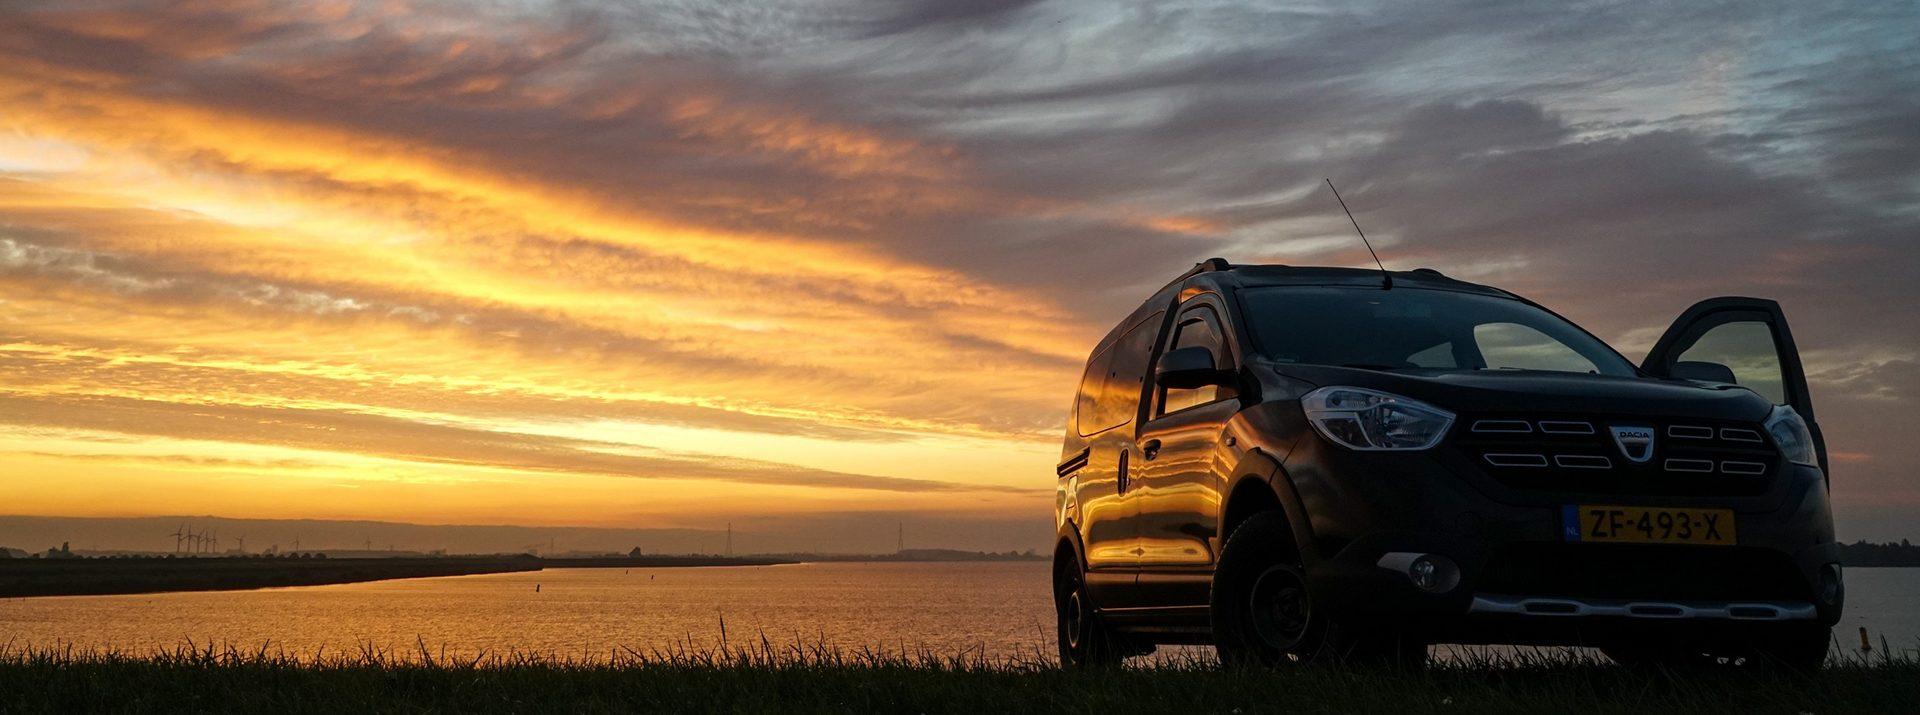 Dacia Dokker zonsondergang sfeerfoto